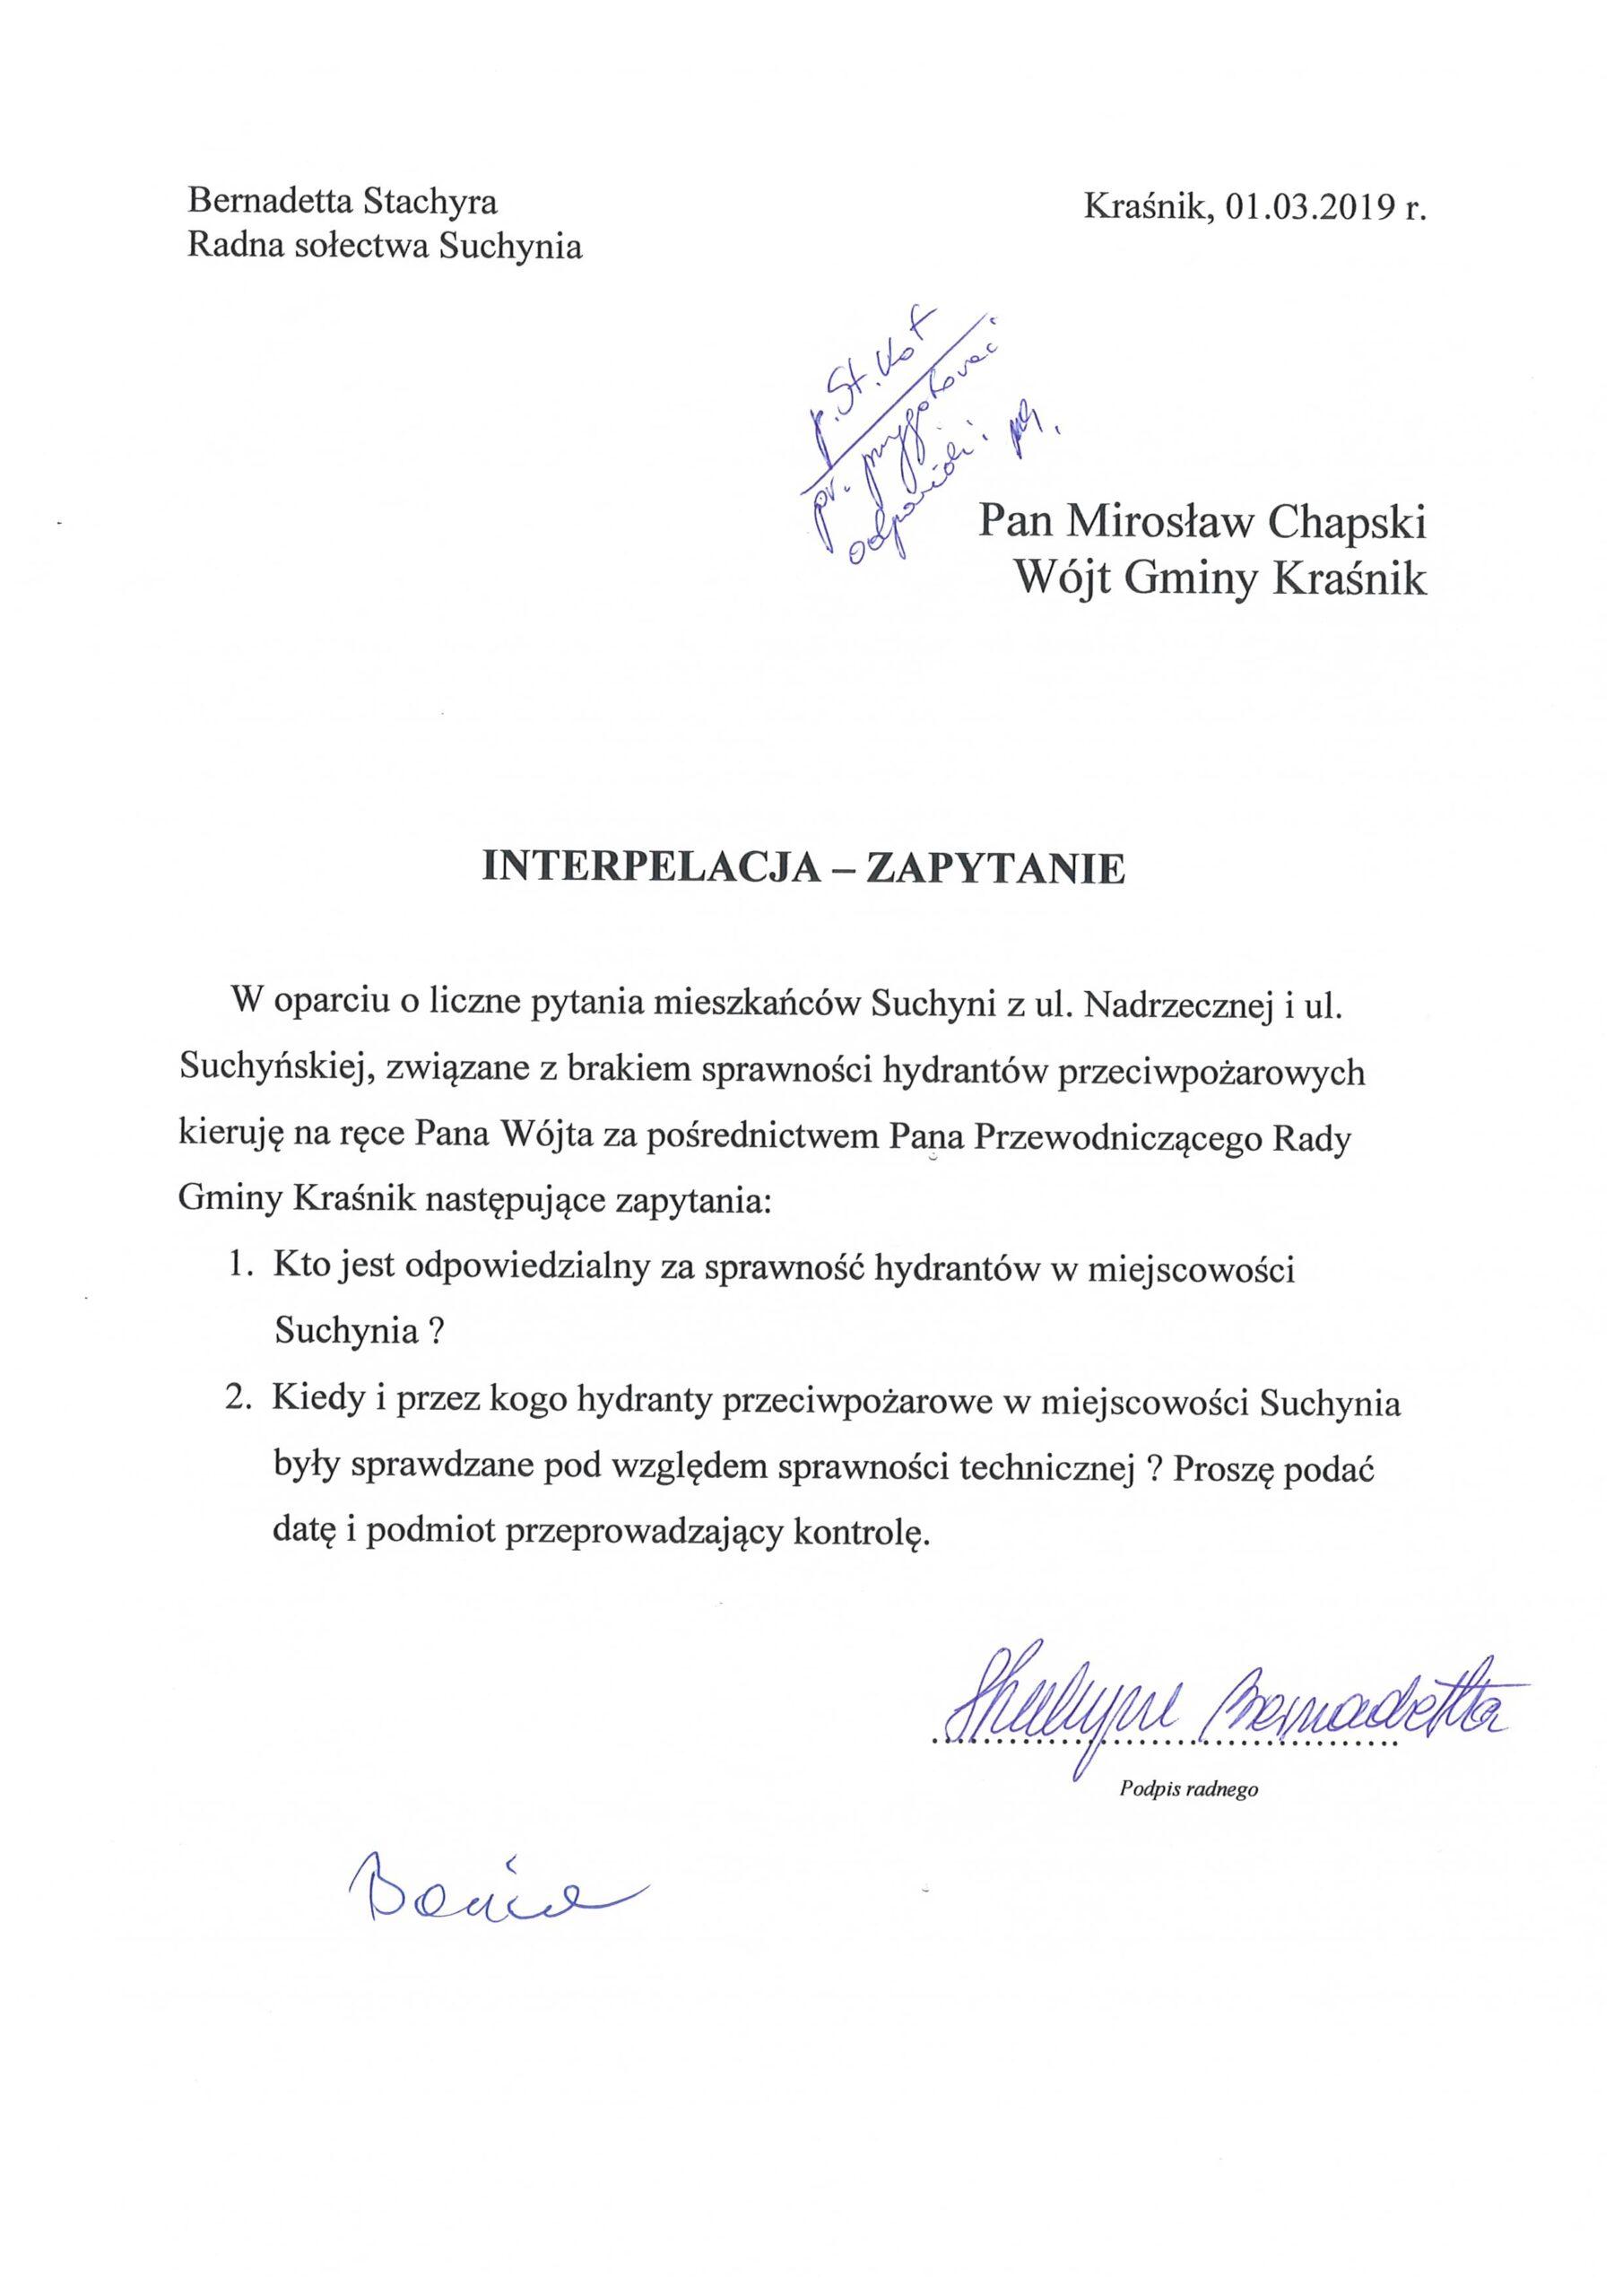 informacja Bernadetta Stachyra